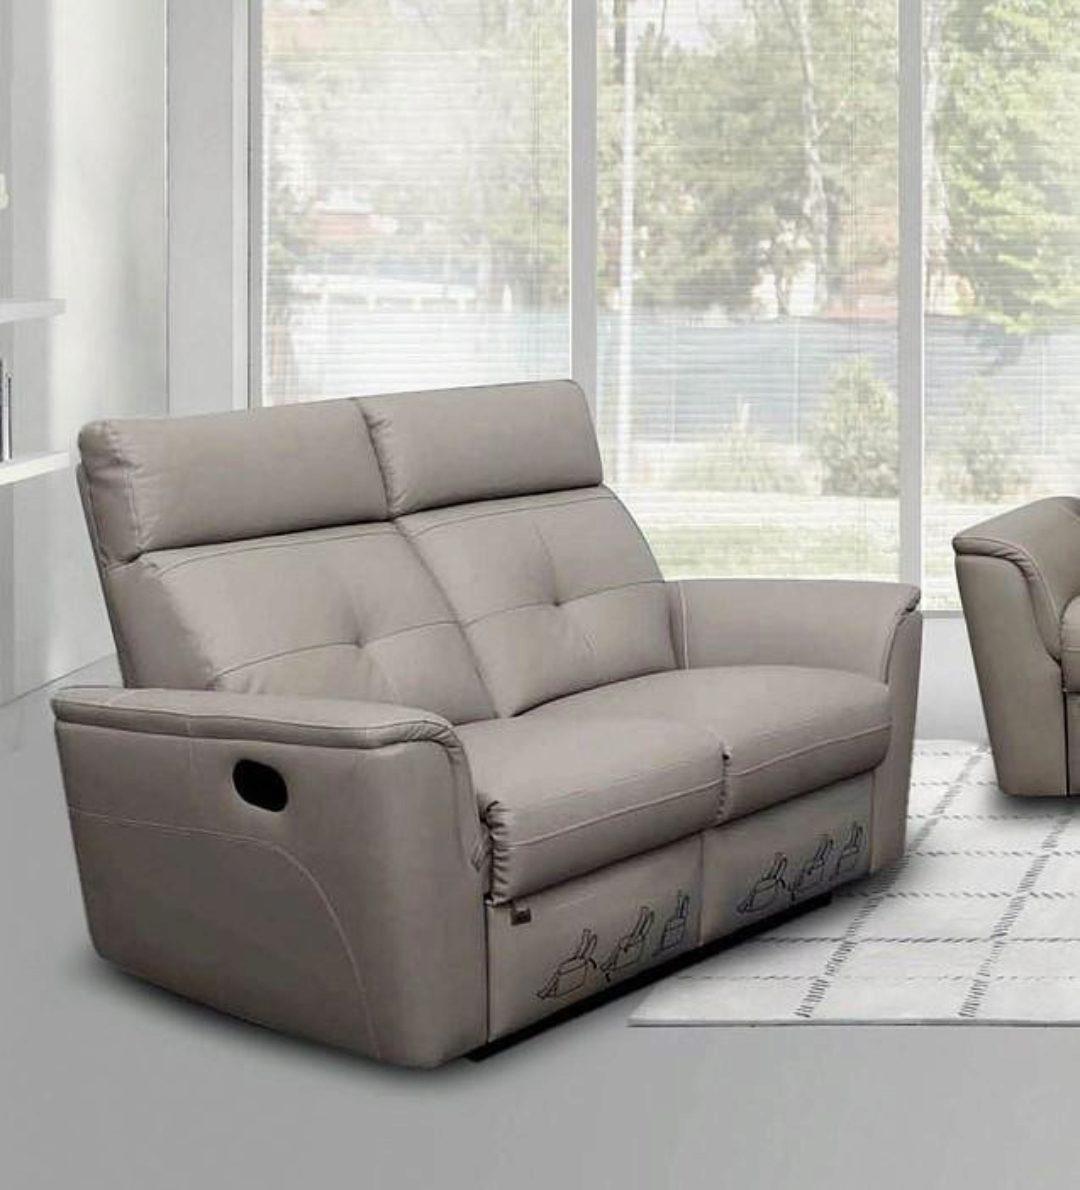 Picture of: Light Grey Italian Leather Manual Recliner Sofa Loveseat Set 2pcs Contemporary Esf 8501 Esf 8501 Sofa Set 2